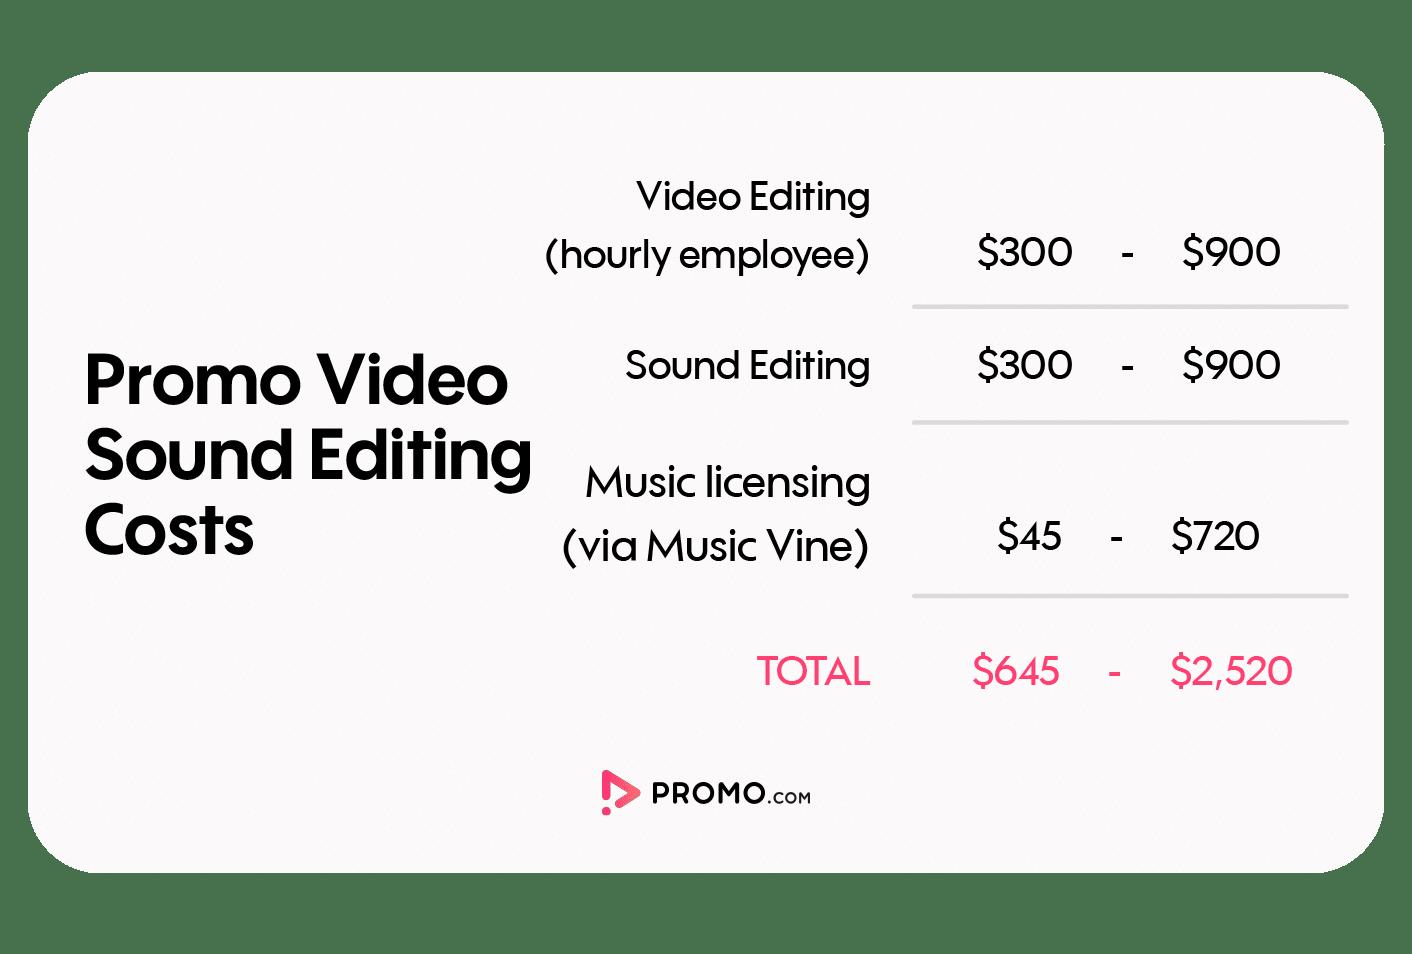 sound editing costs